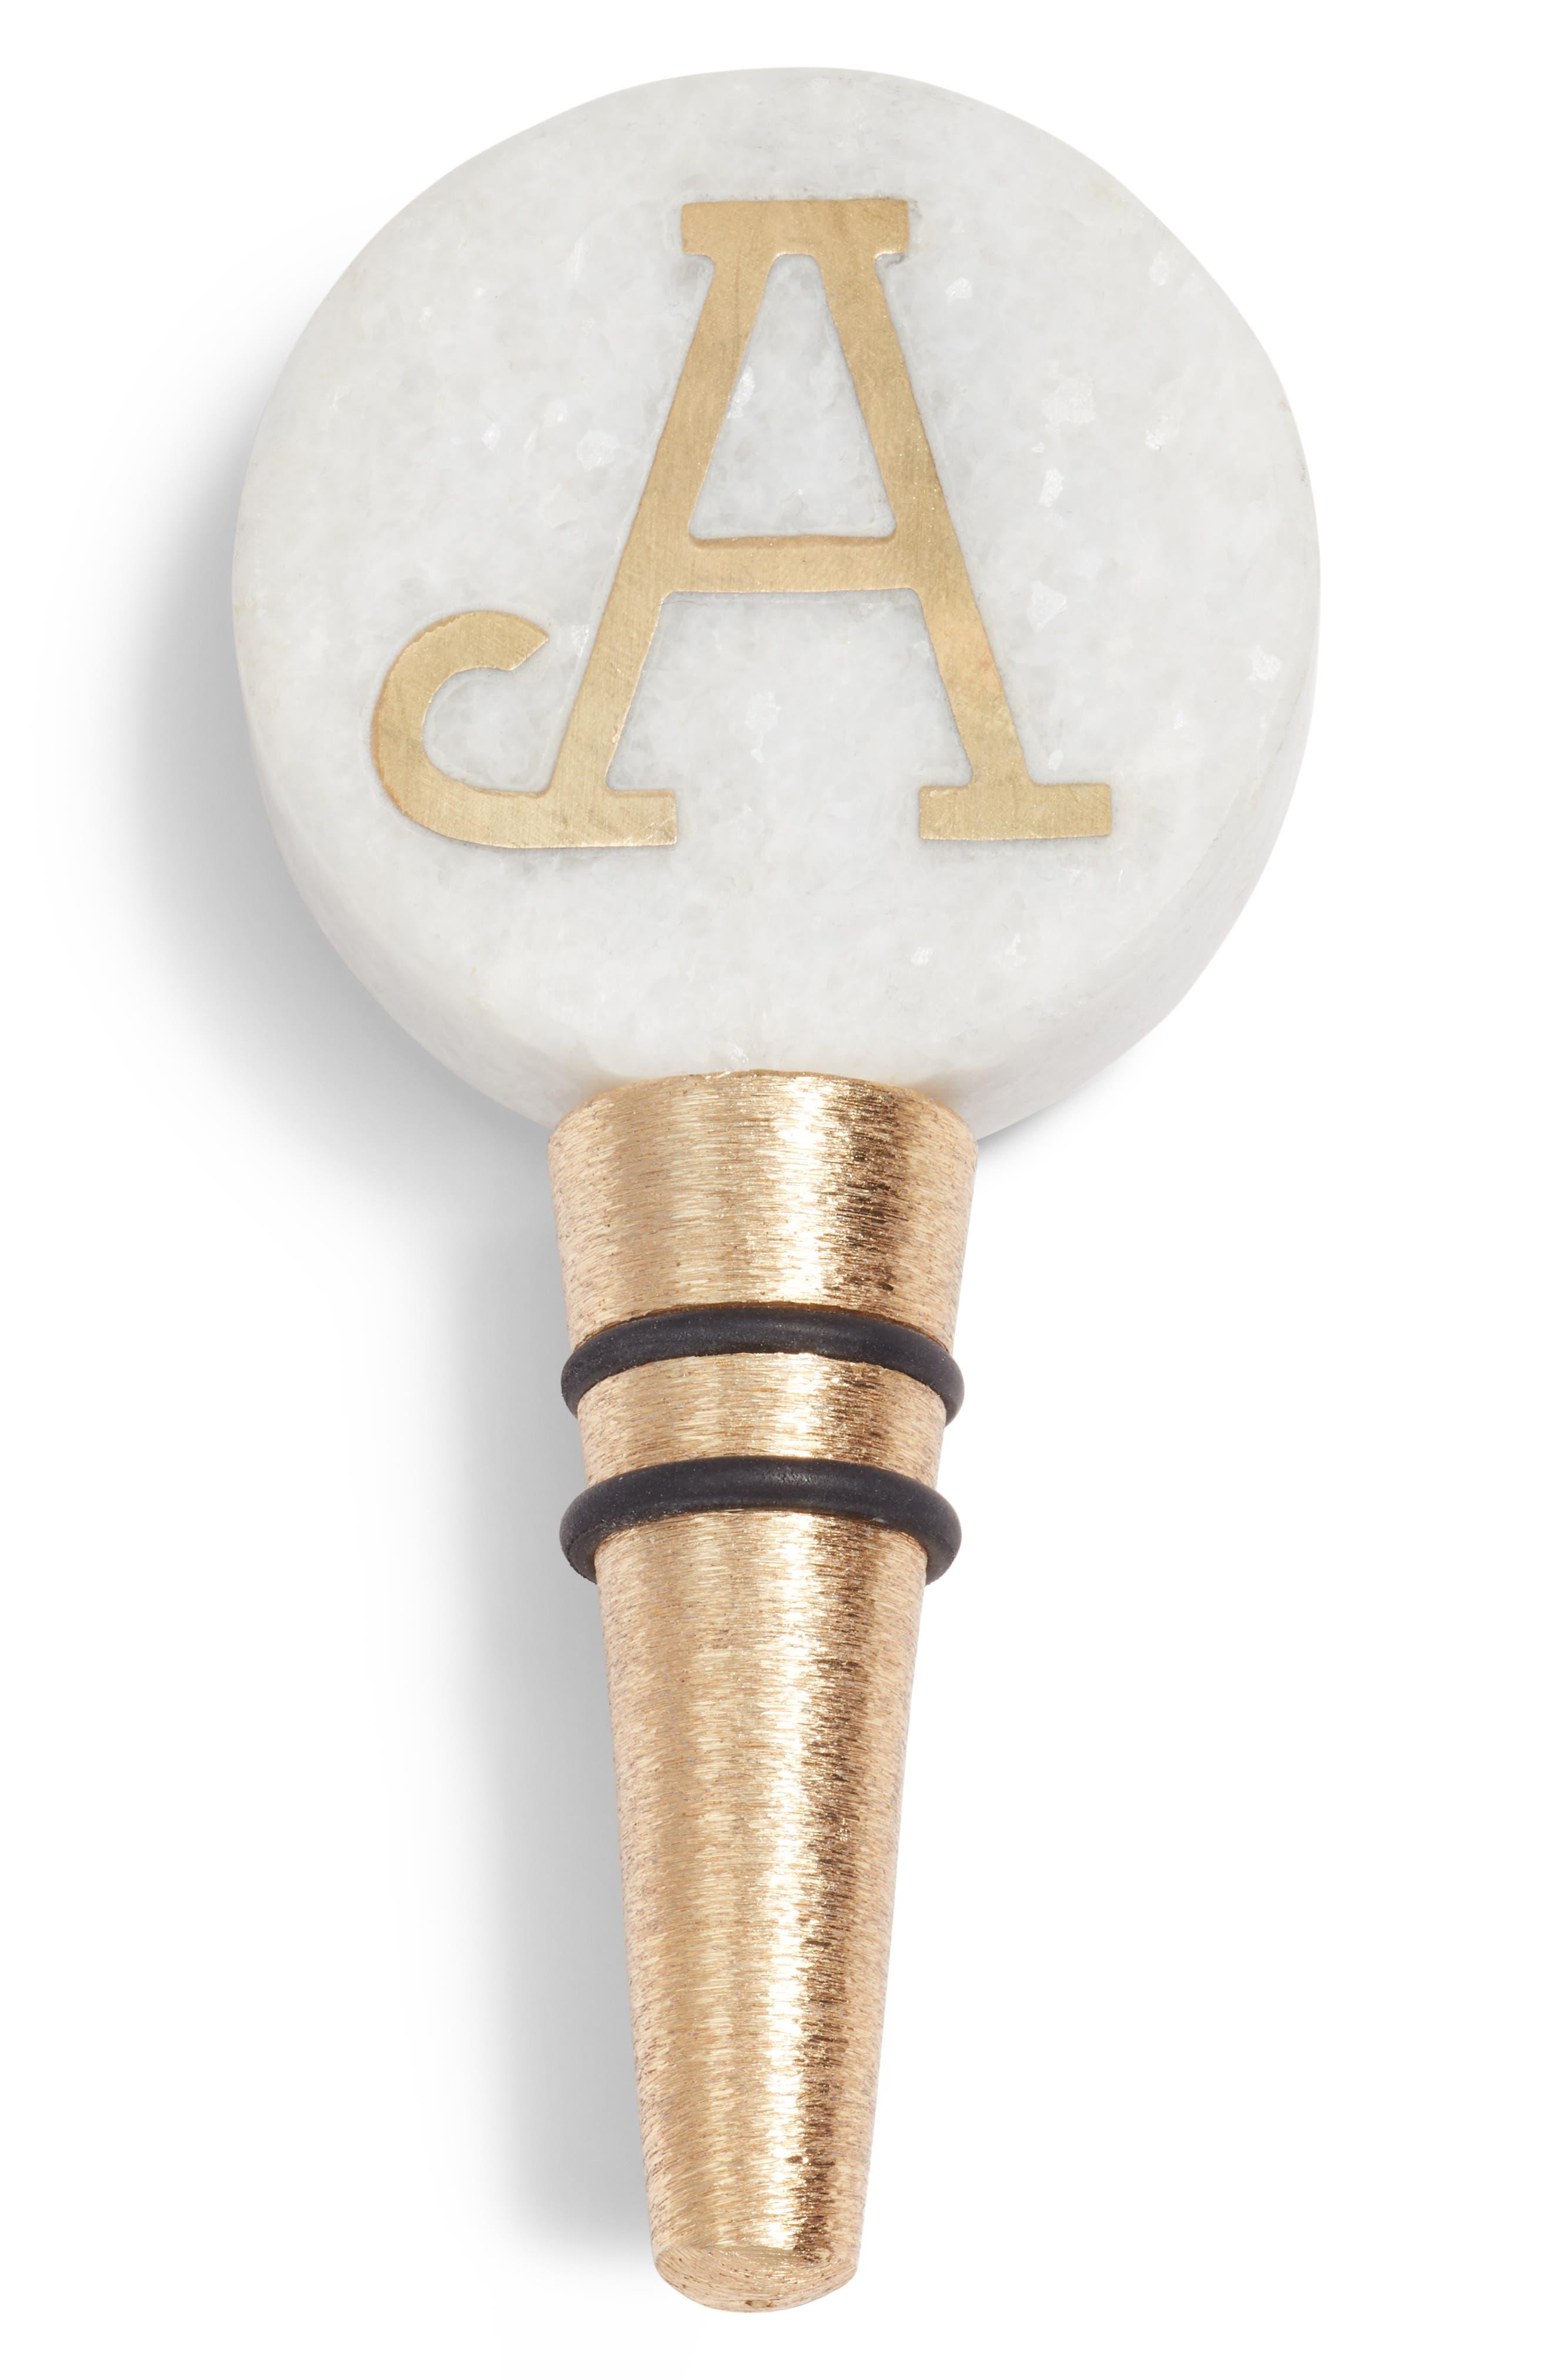 Monogram Marble Bottle Stopper,                             Main thumbnail 1, color,                             WHITE/ GOLD A